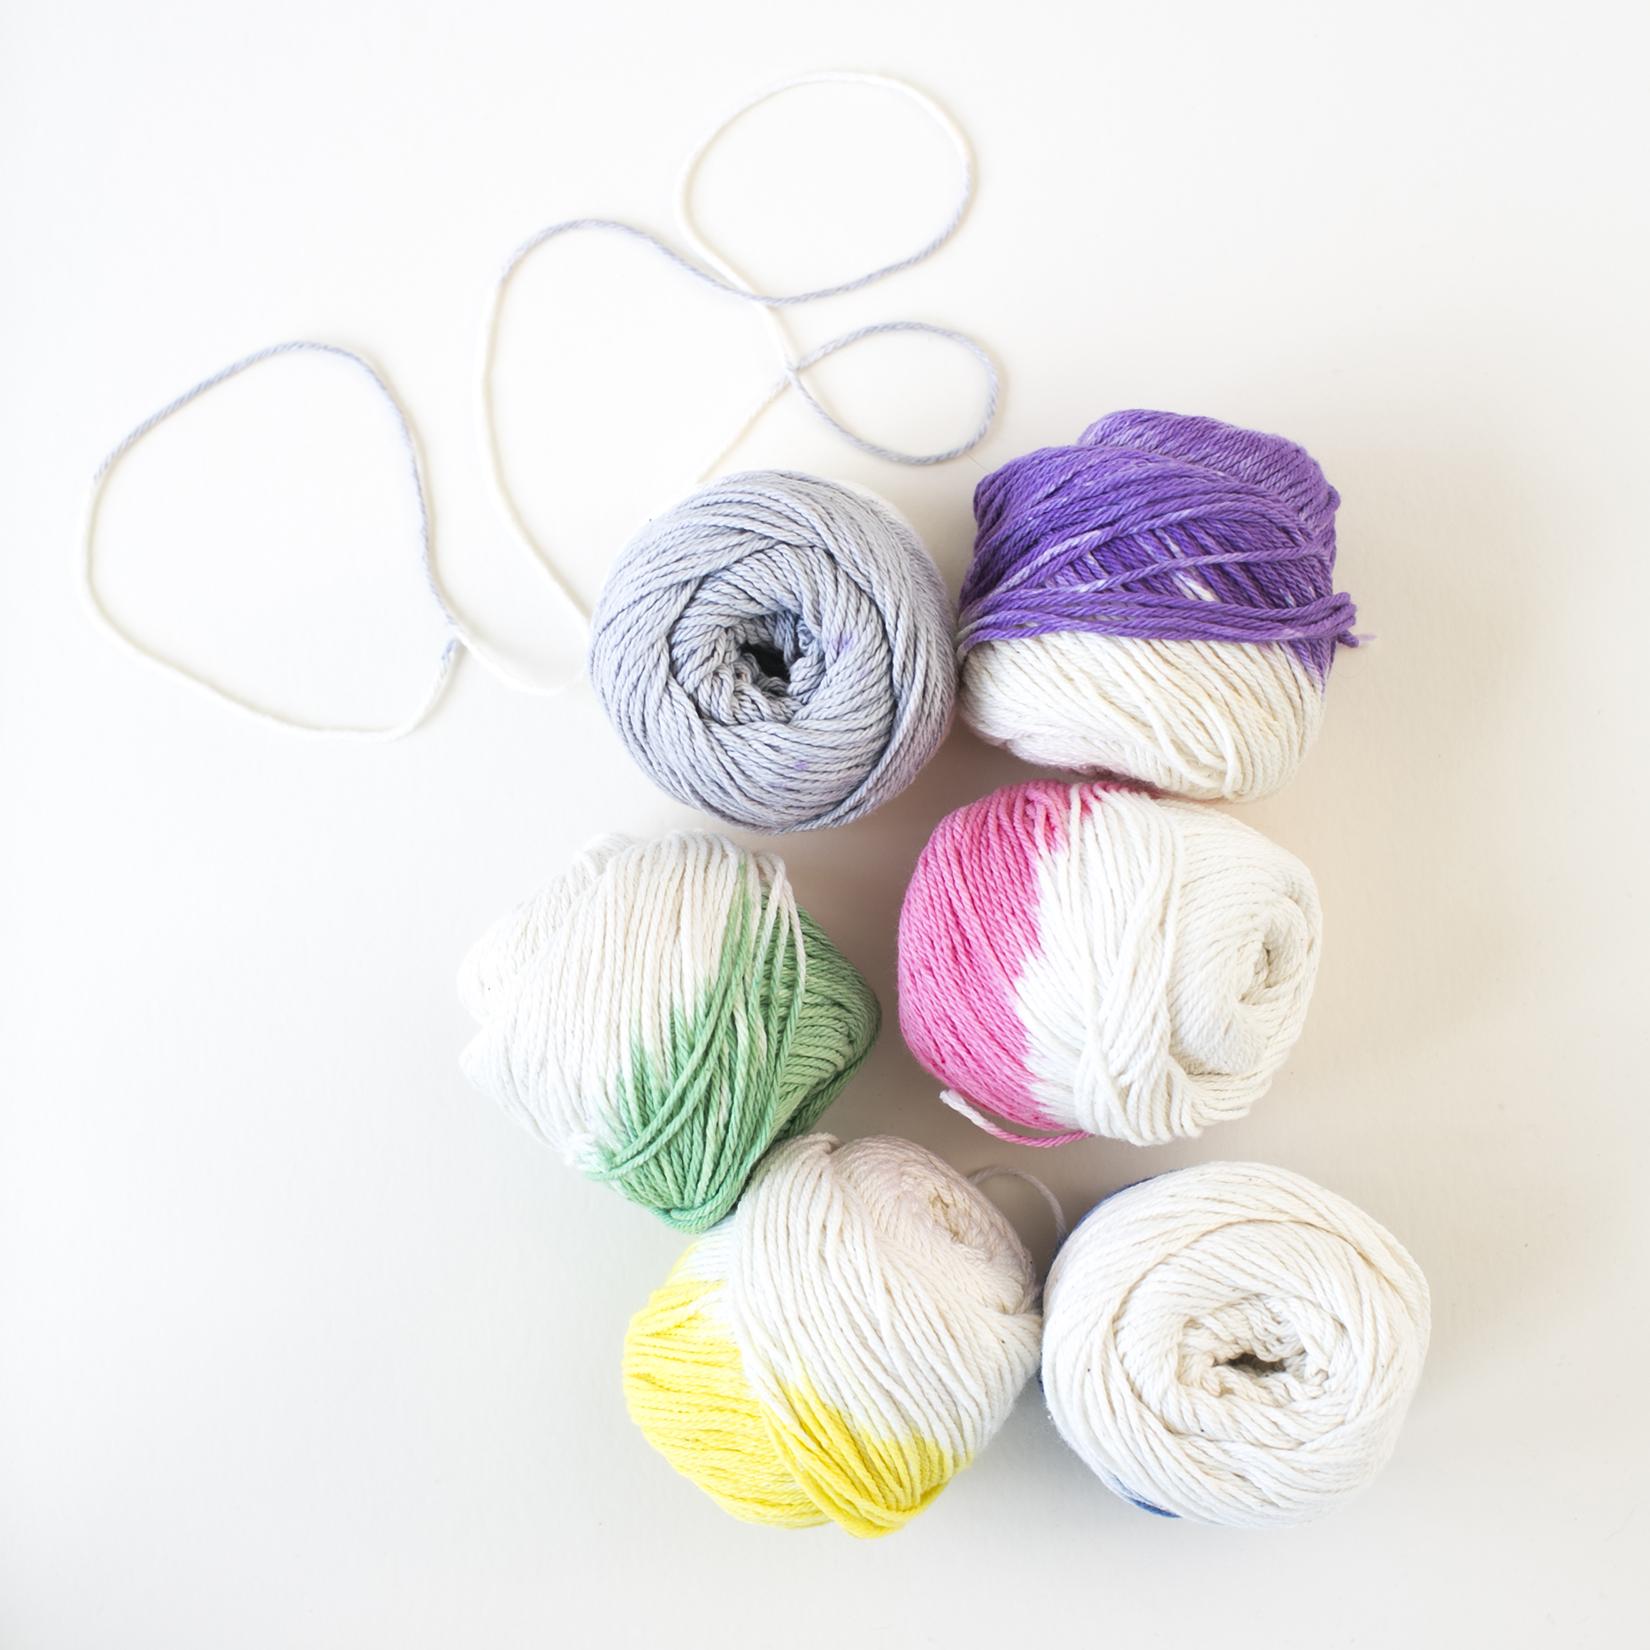 Dip-dyed Yarn  for  Charlotte Lane |  Heidi Geldhauser